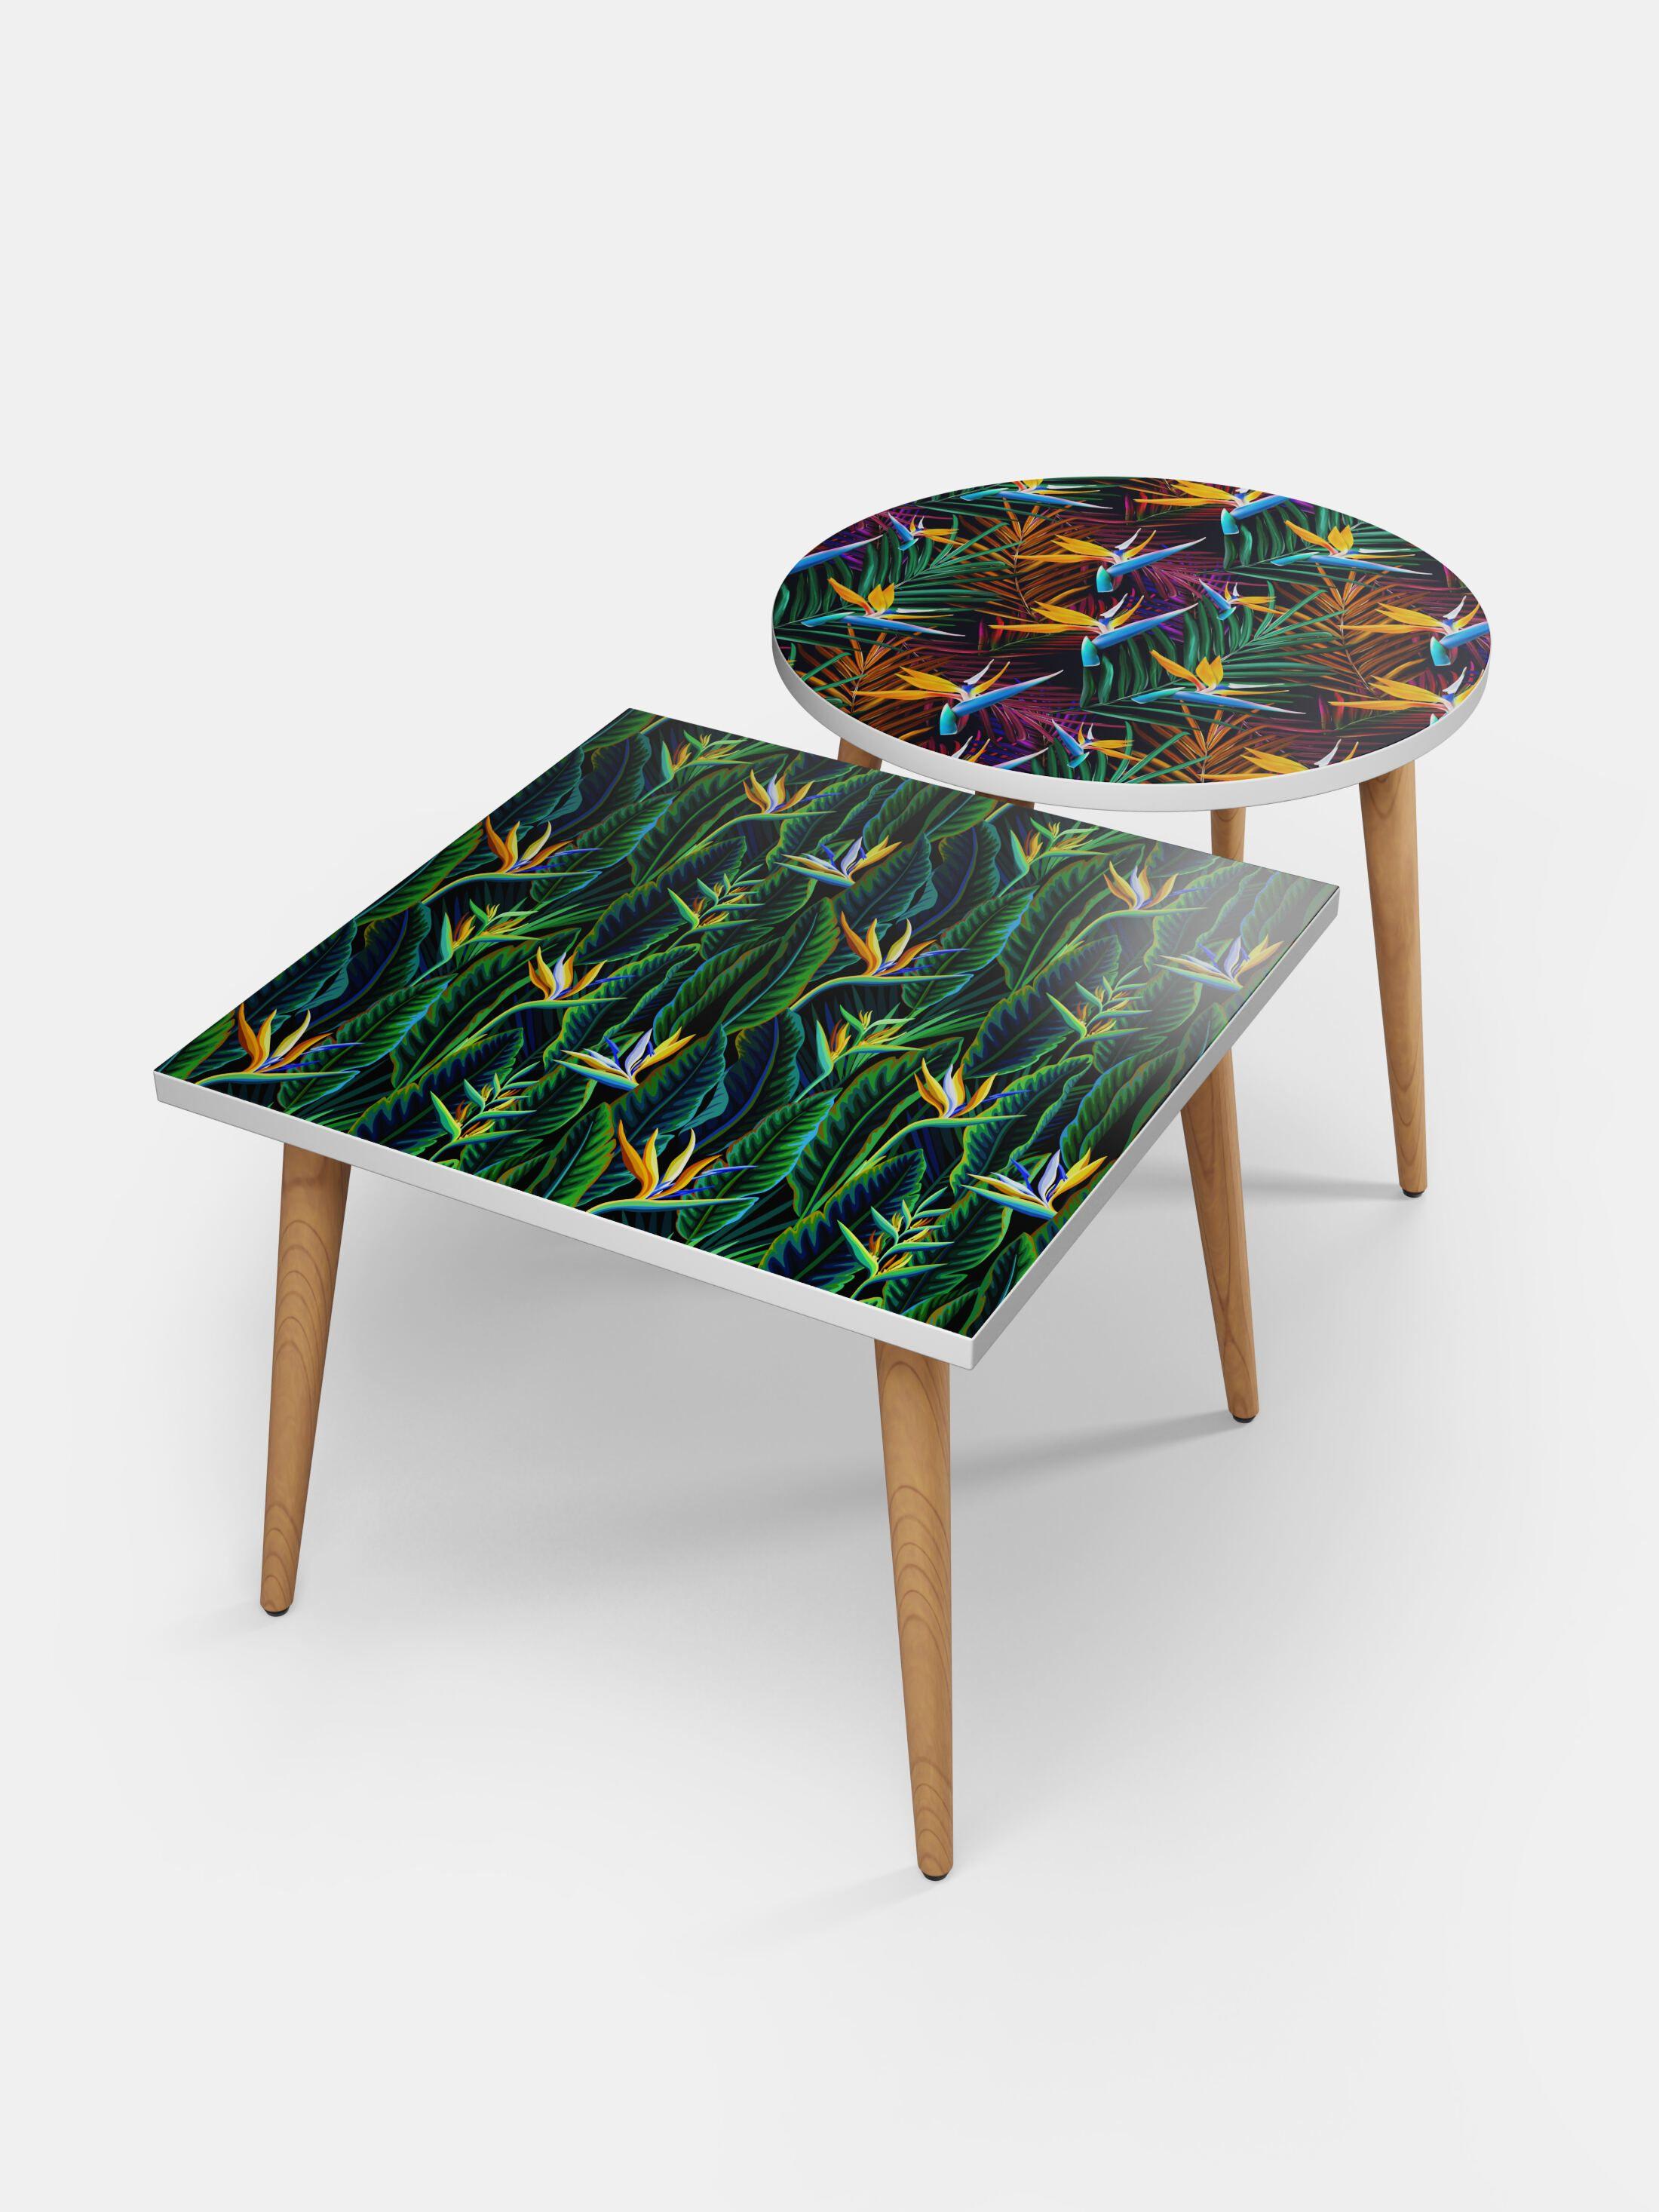 Tavolini da caffè personalizzati